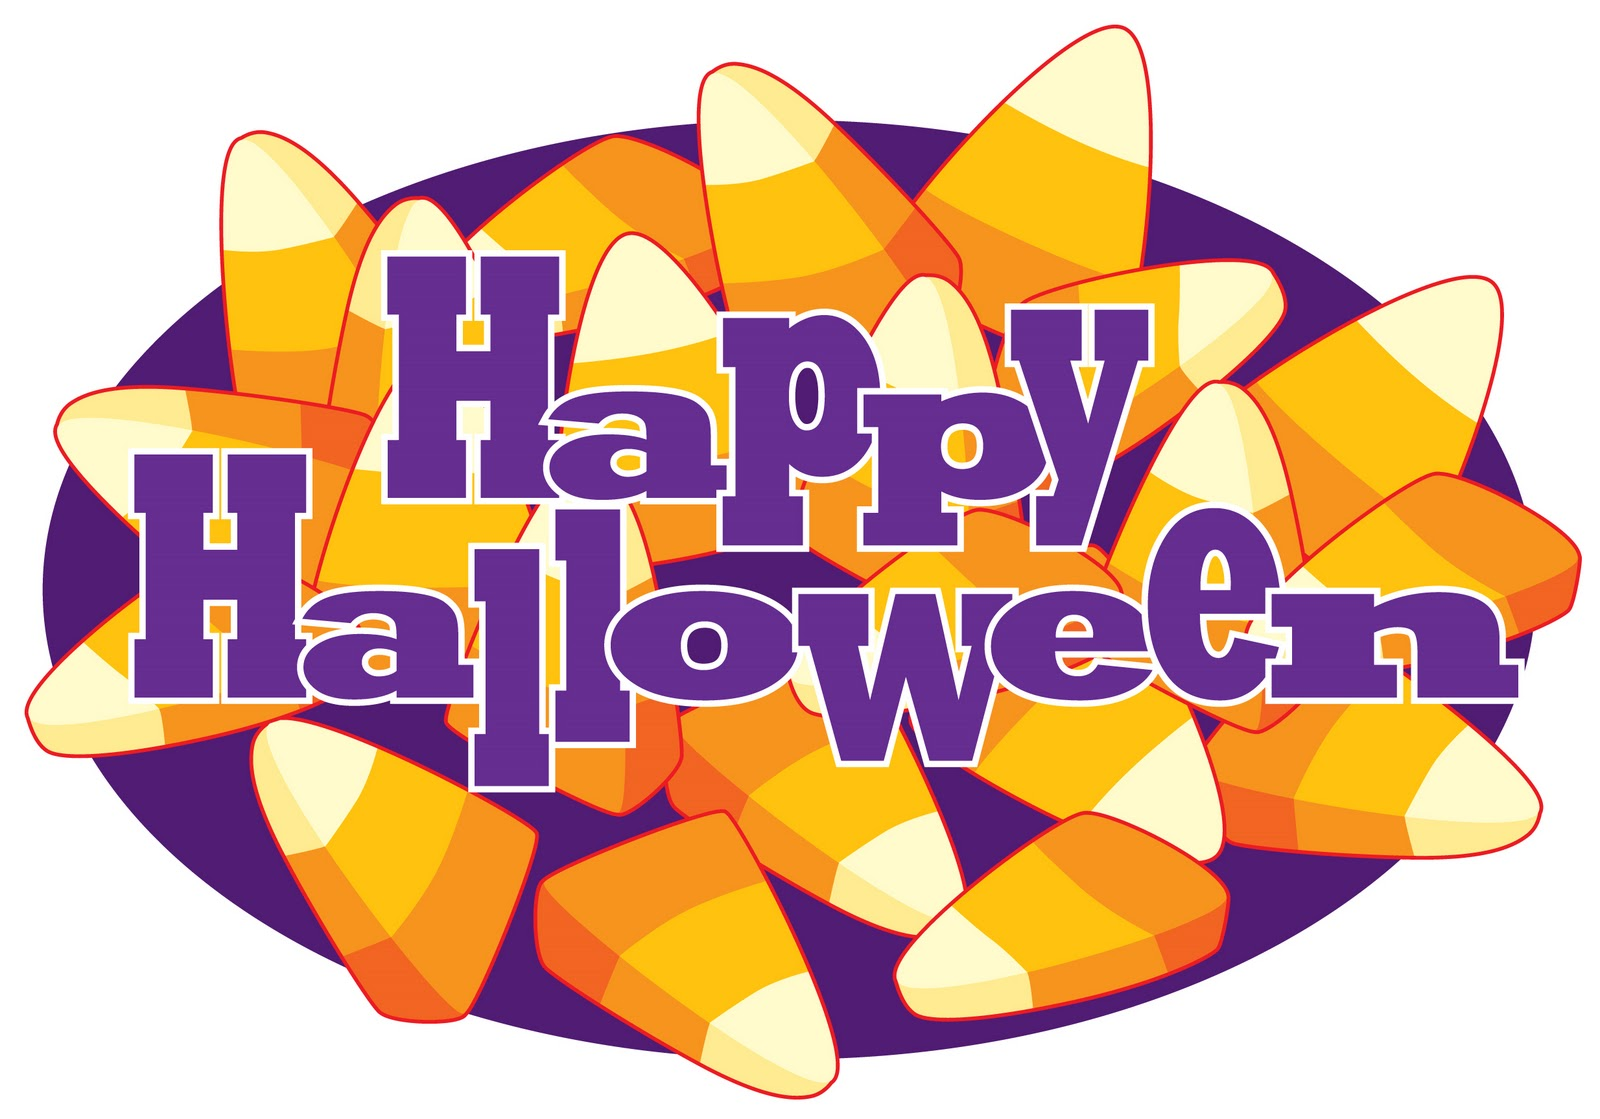 Halloween Clipart Happy Halloween Clipar-Halloween Clipart Happy Halloween Clipart Happy Halloween Clipart-12